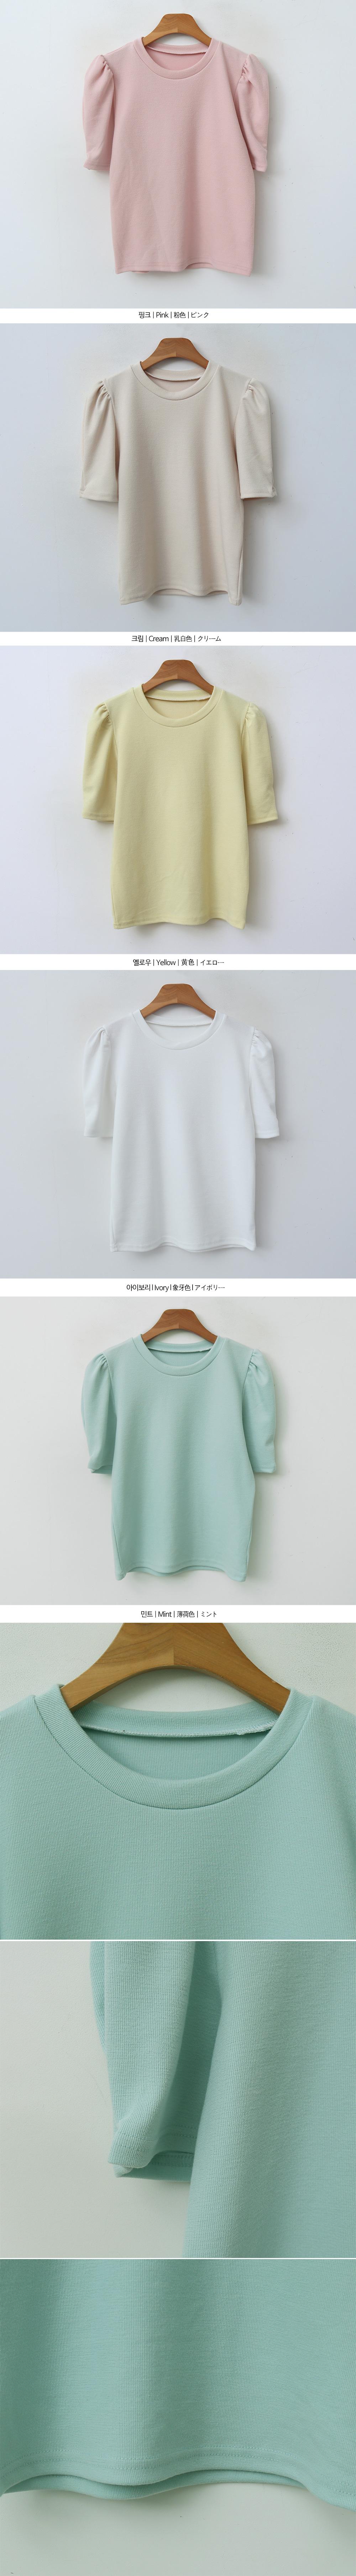 soy puff t-shirt